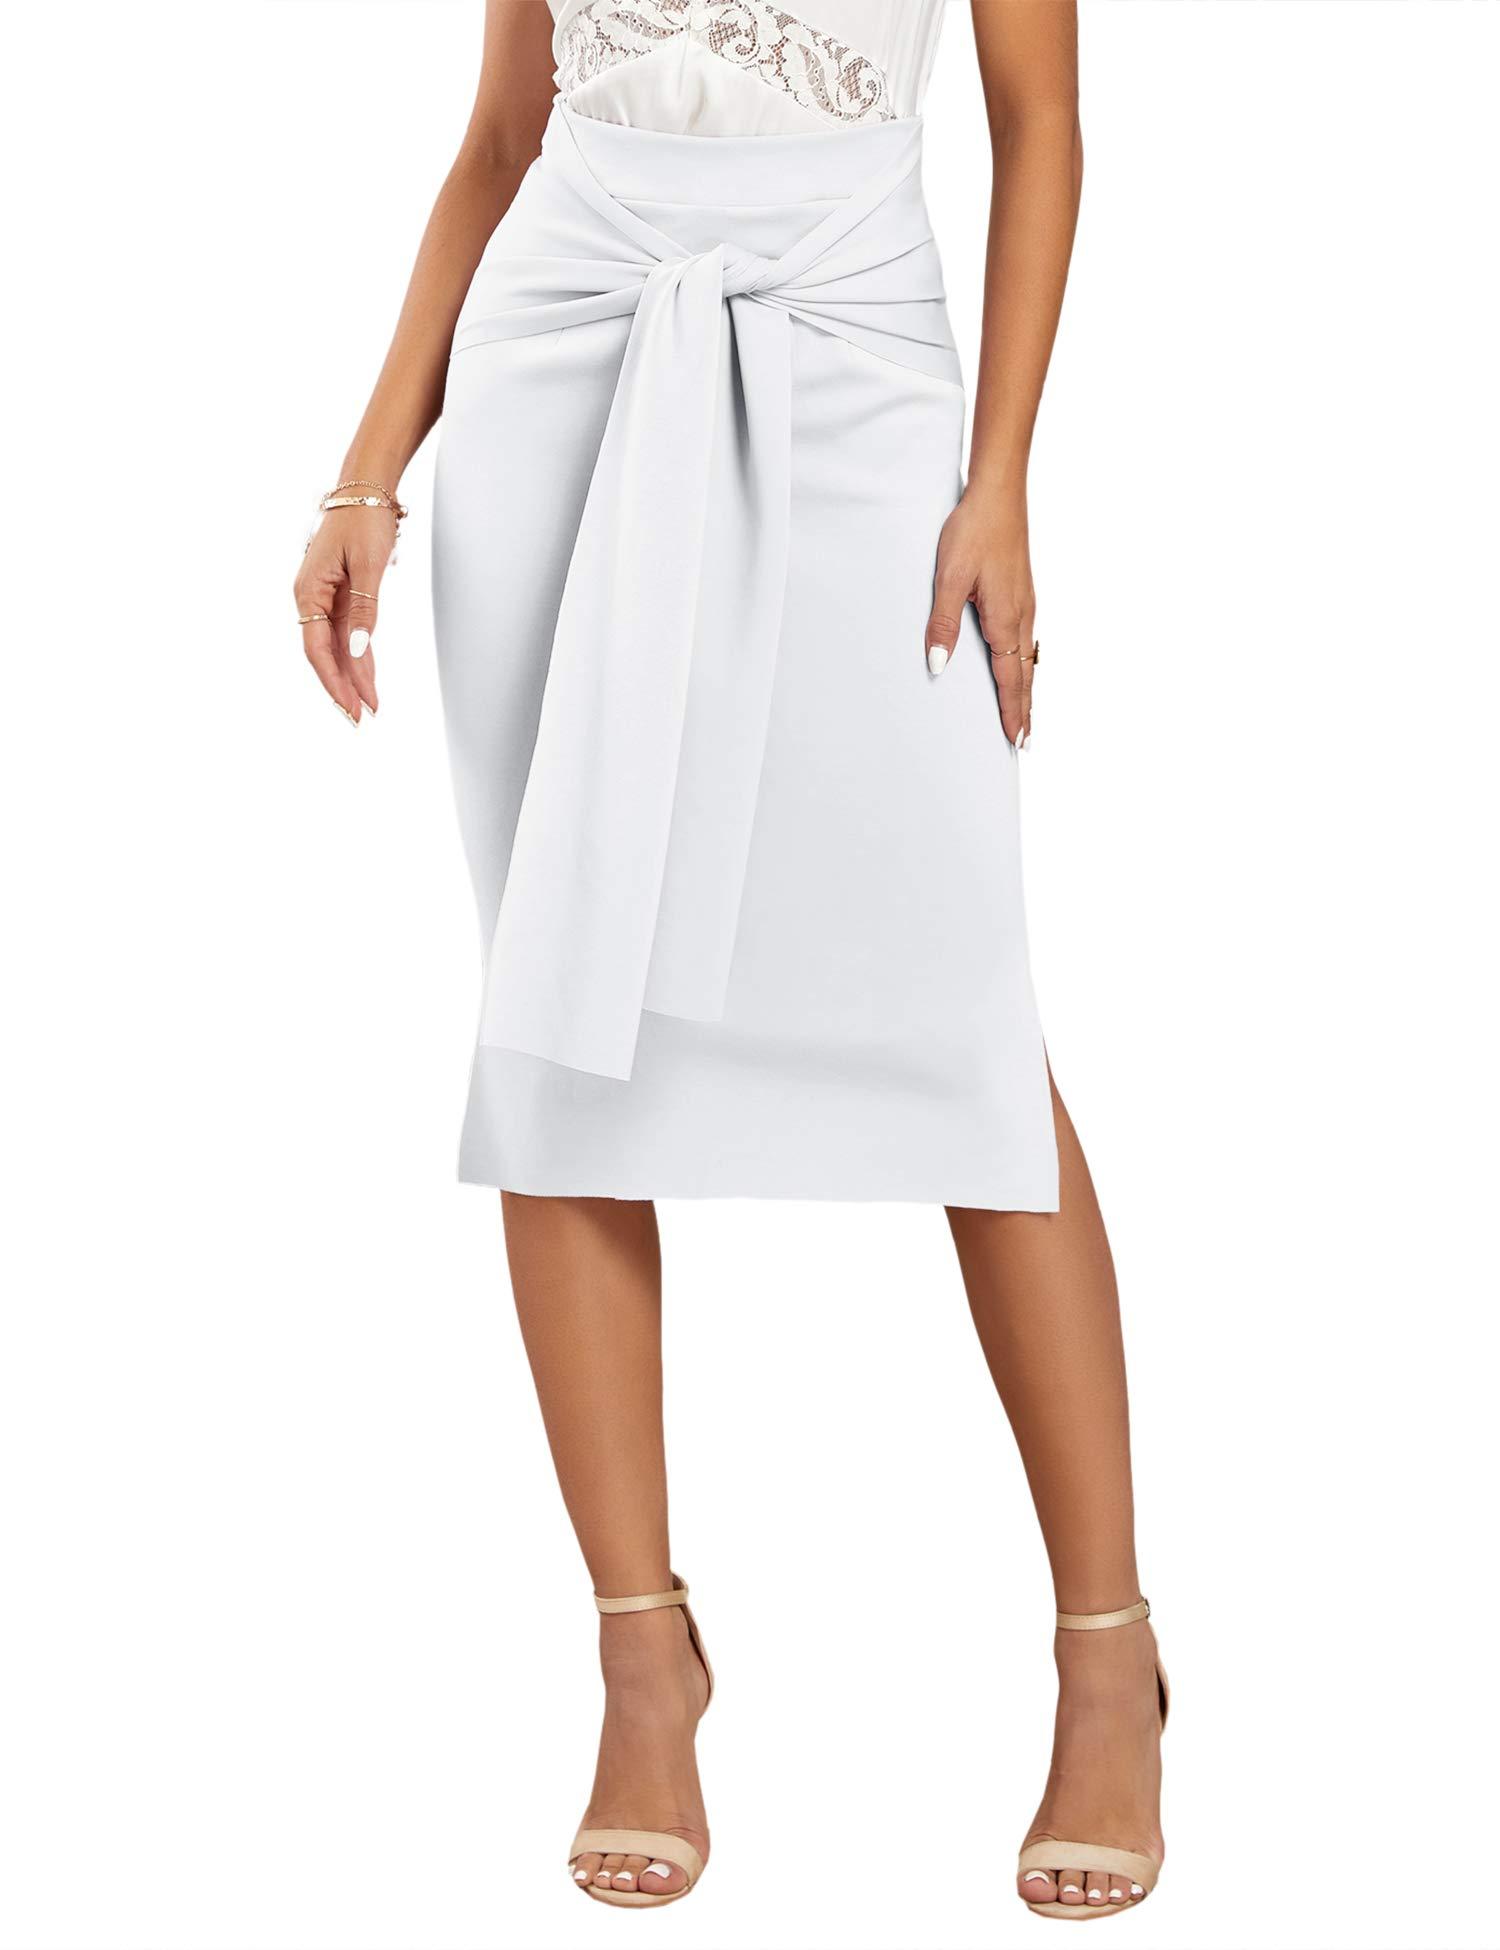 Foshow Women's Elegant Tie Front Pencil Skirt Banded Knee Length High Waist Slit Work Bodycon